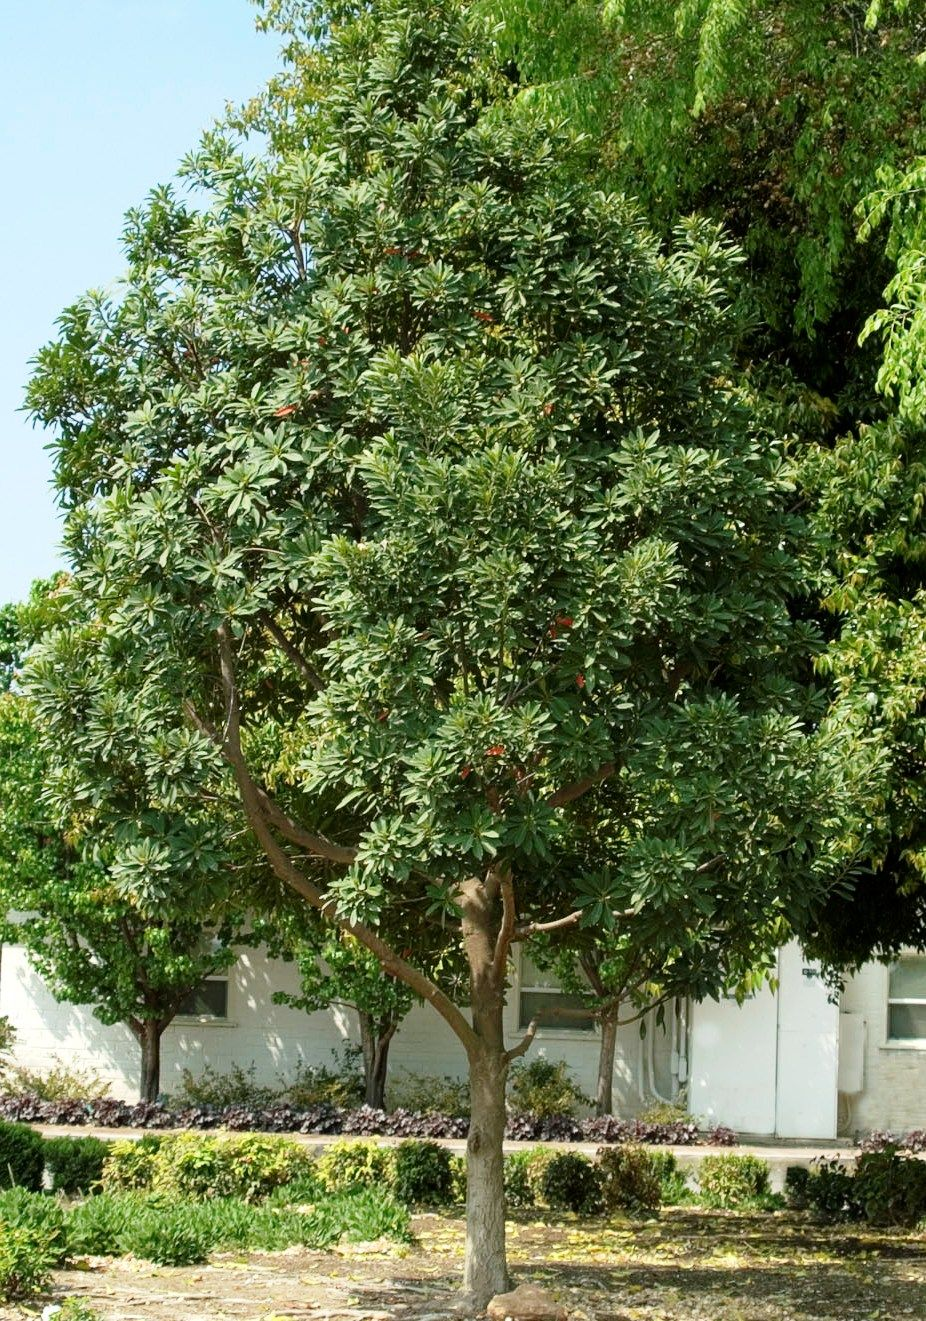 Japanese Blueberry Tree Shogun 174 Series Monrovia